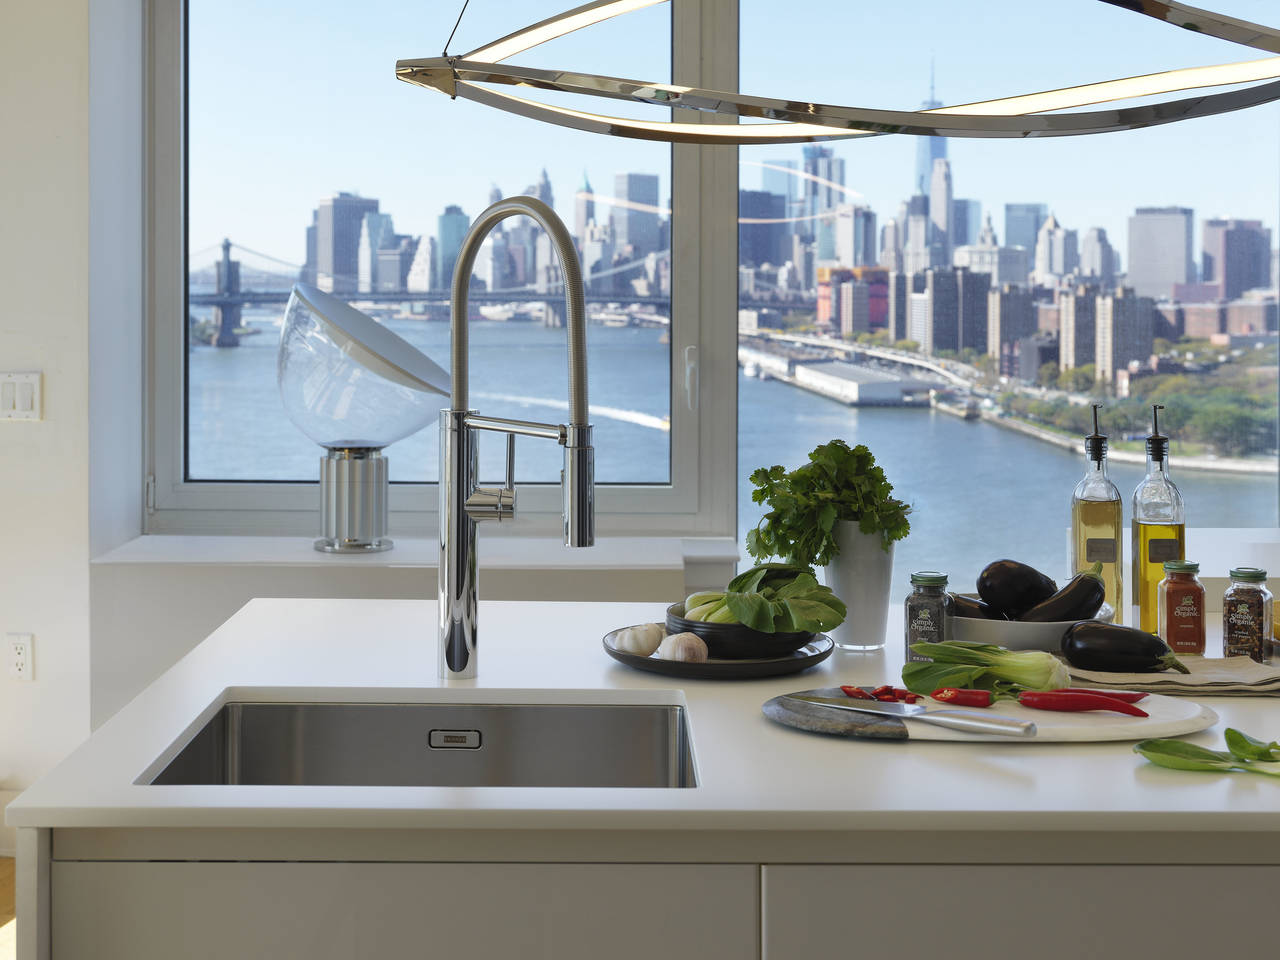 Le vasche Franke, stile e funzionalità | Ambiente Cucina